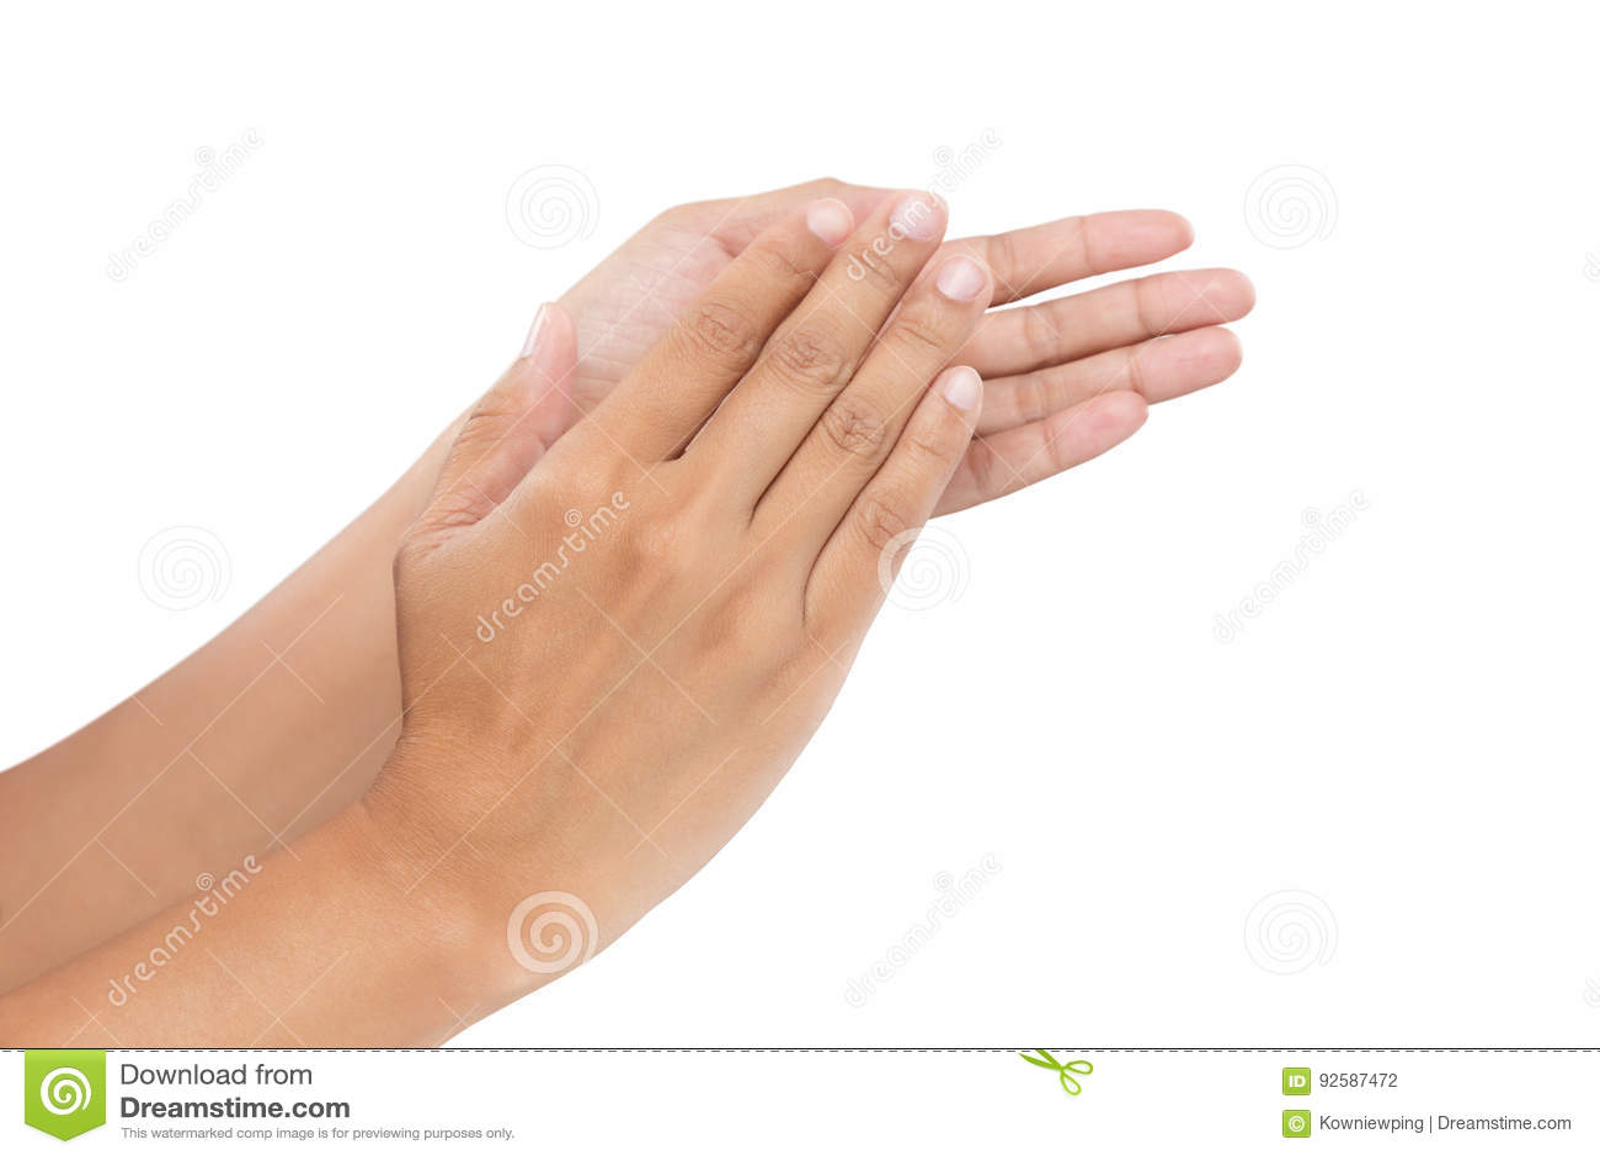 Women clapping hands